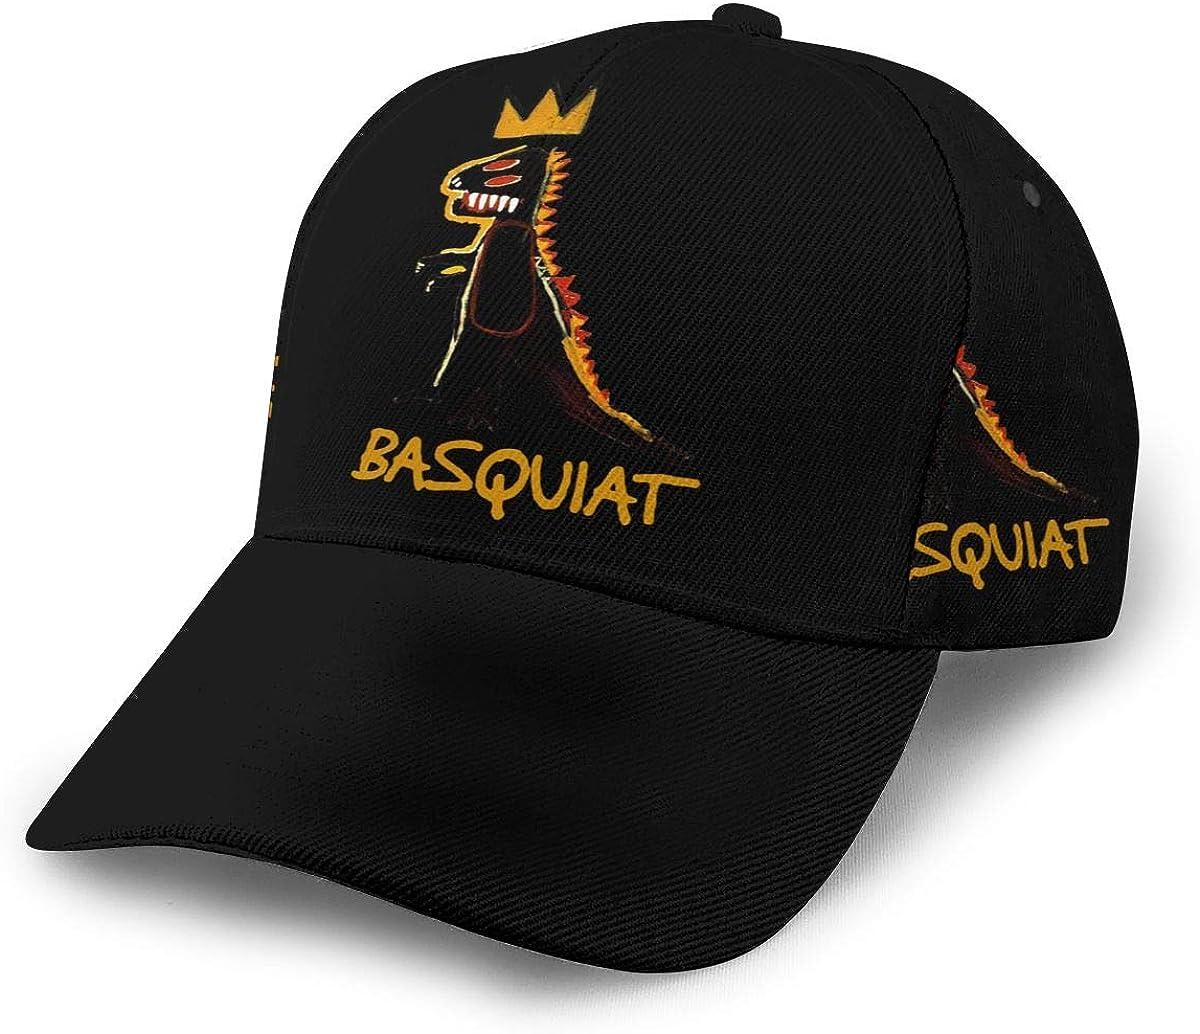 WilliamWButler Jean Michel Basquiat Baseball Cap Trucker Hat Adjustable Fashion Breathable Sports Caps Unisex